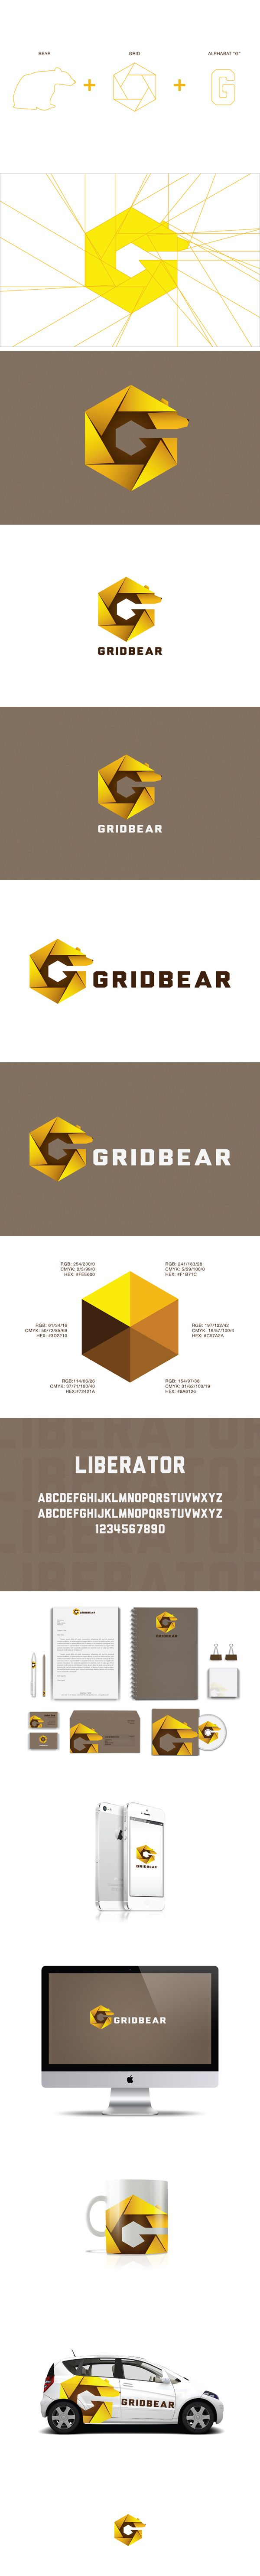 * GridBear Visual Identity by www.BlickeDeeler.de | Visit our website: www.blickedeeler.de/leistungen/corporate-design